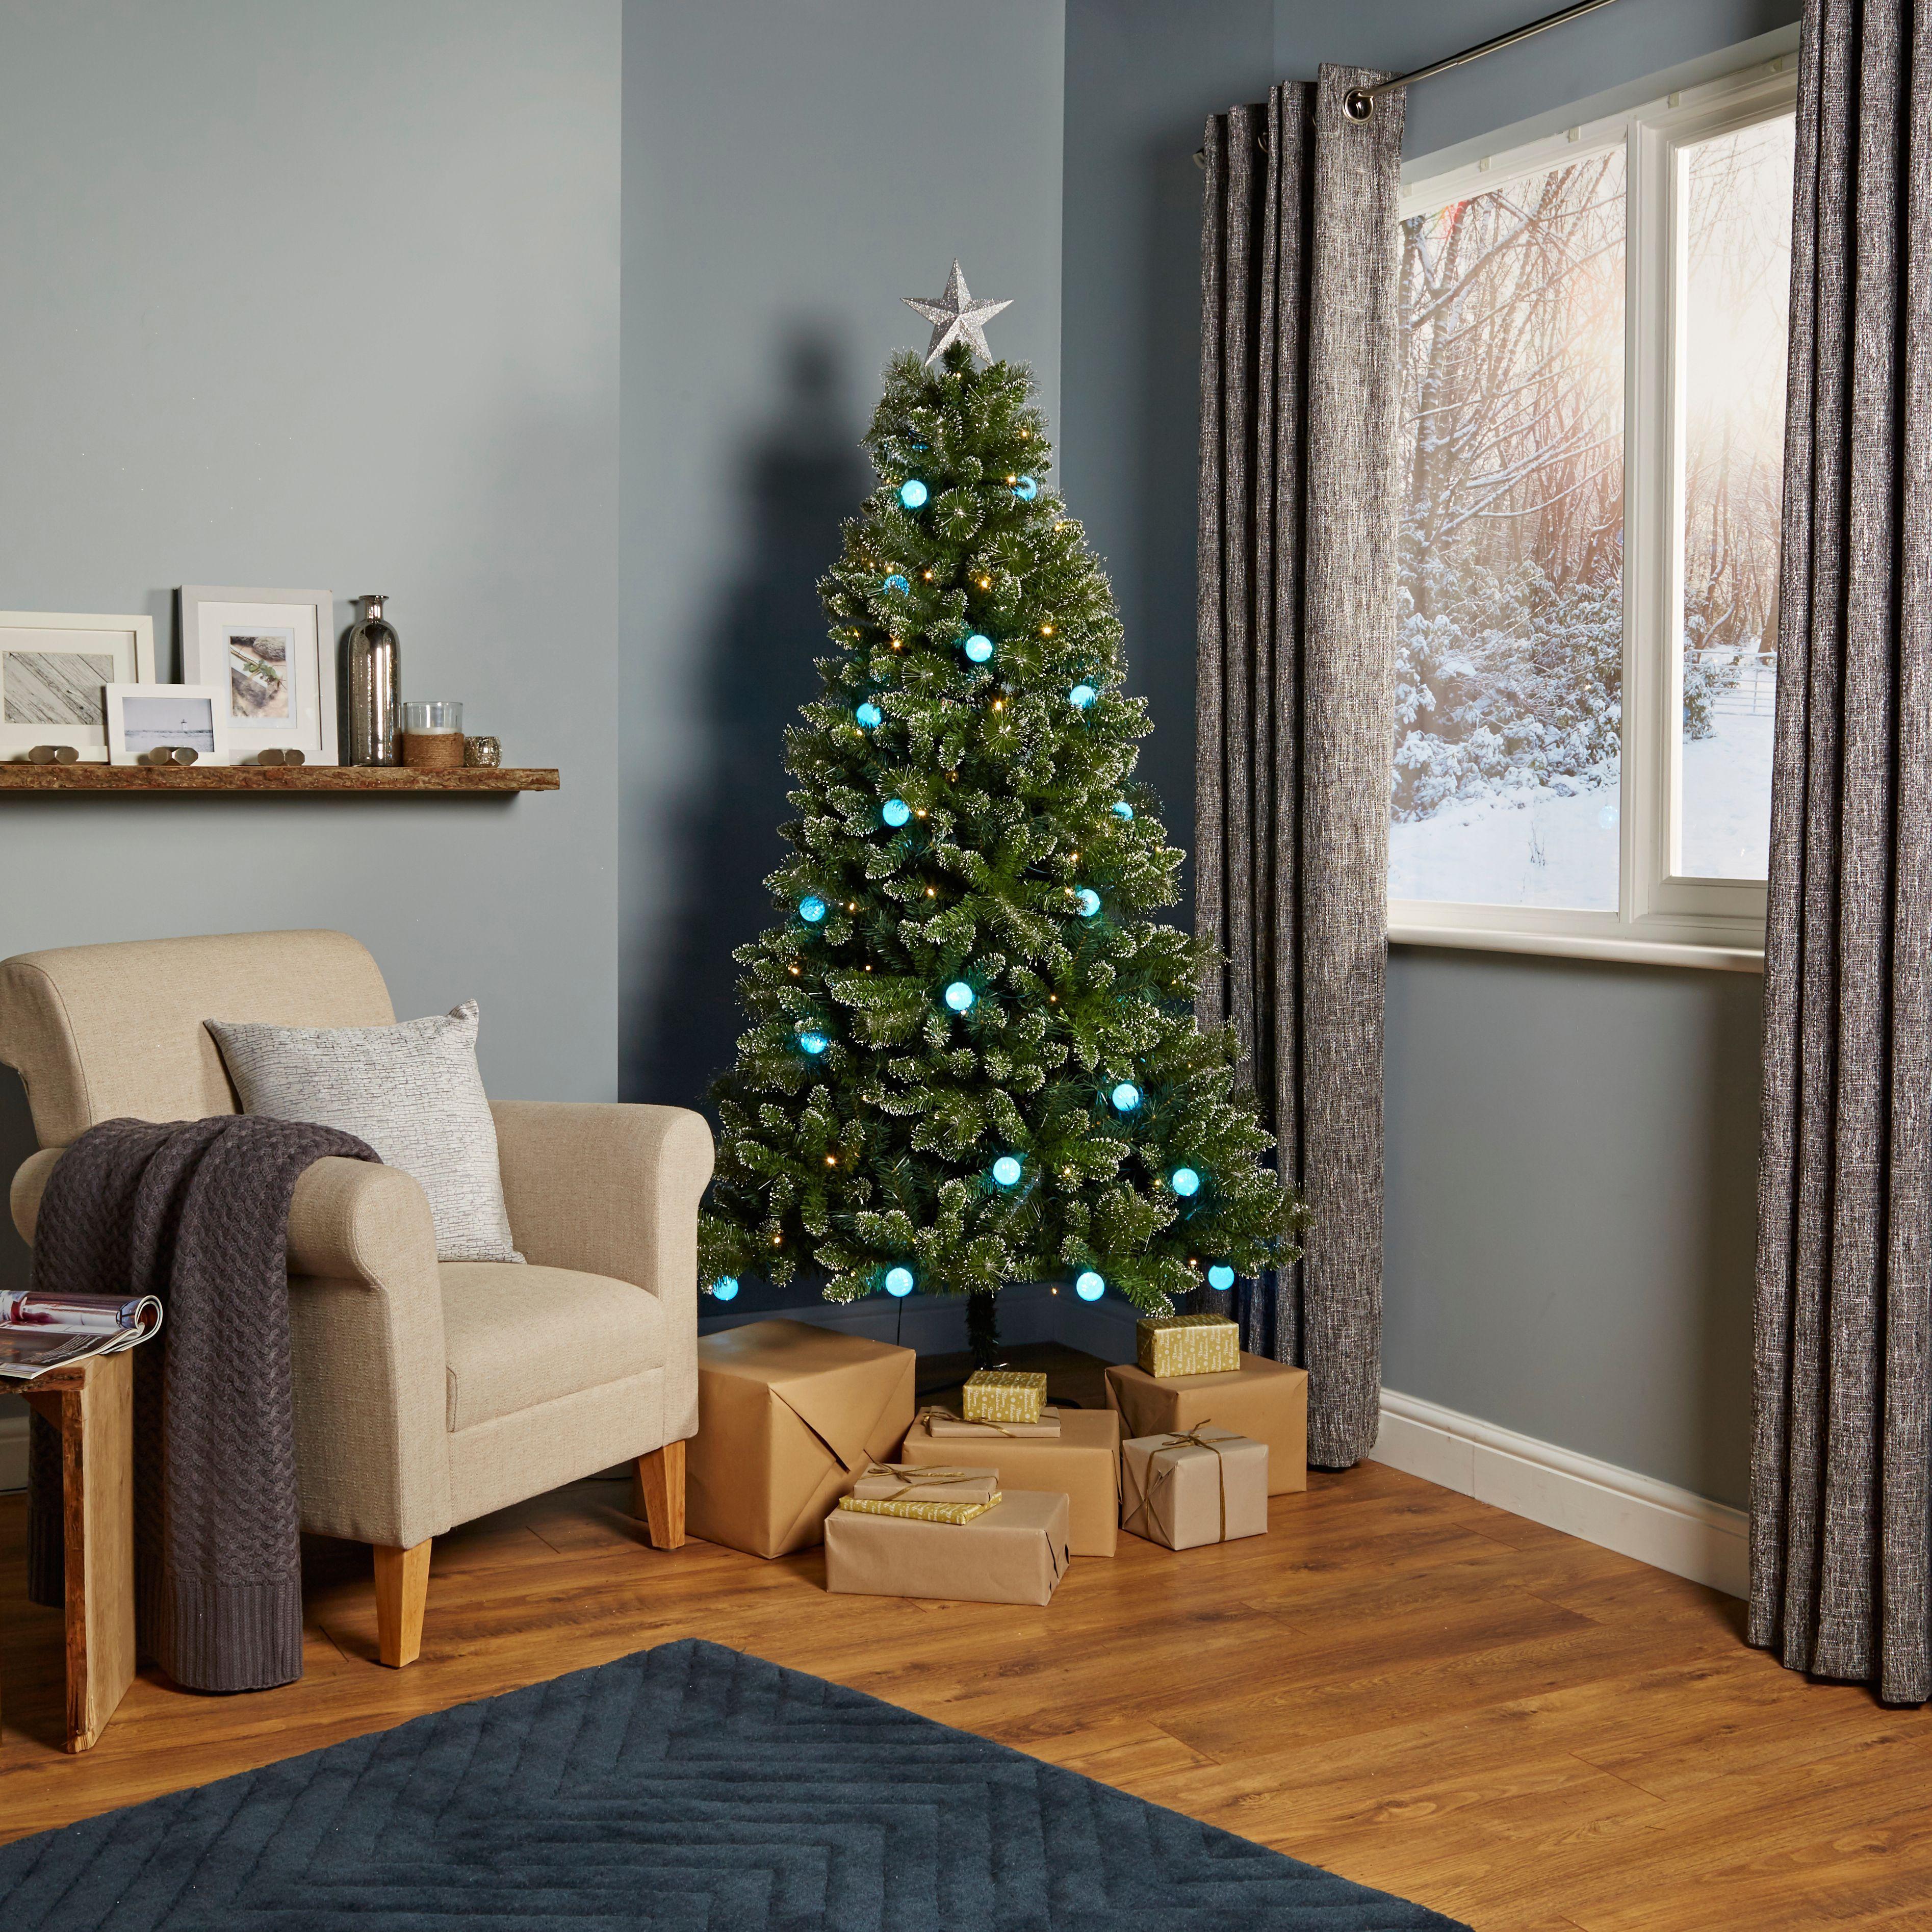 6ft 6In Rockingham Pre-Lit u0026 Pre Decorated Christmas & Eiger Artificial Christmas Trees | Christmas Trees | Christmas ... pezcame.com